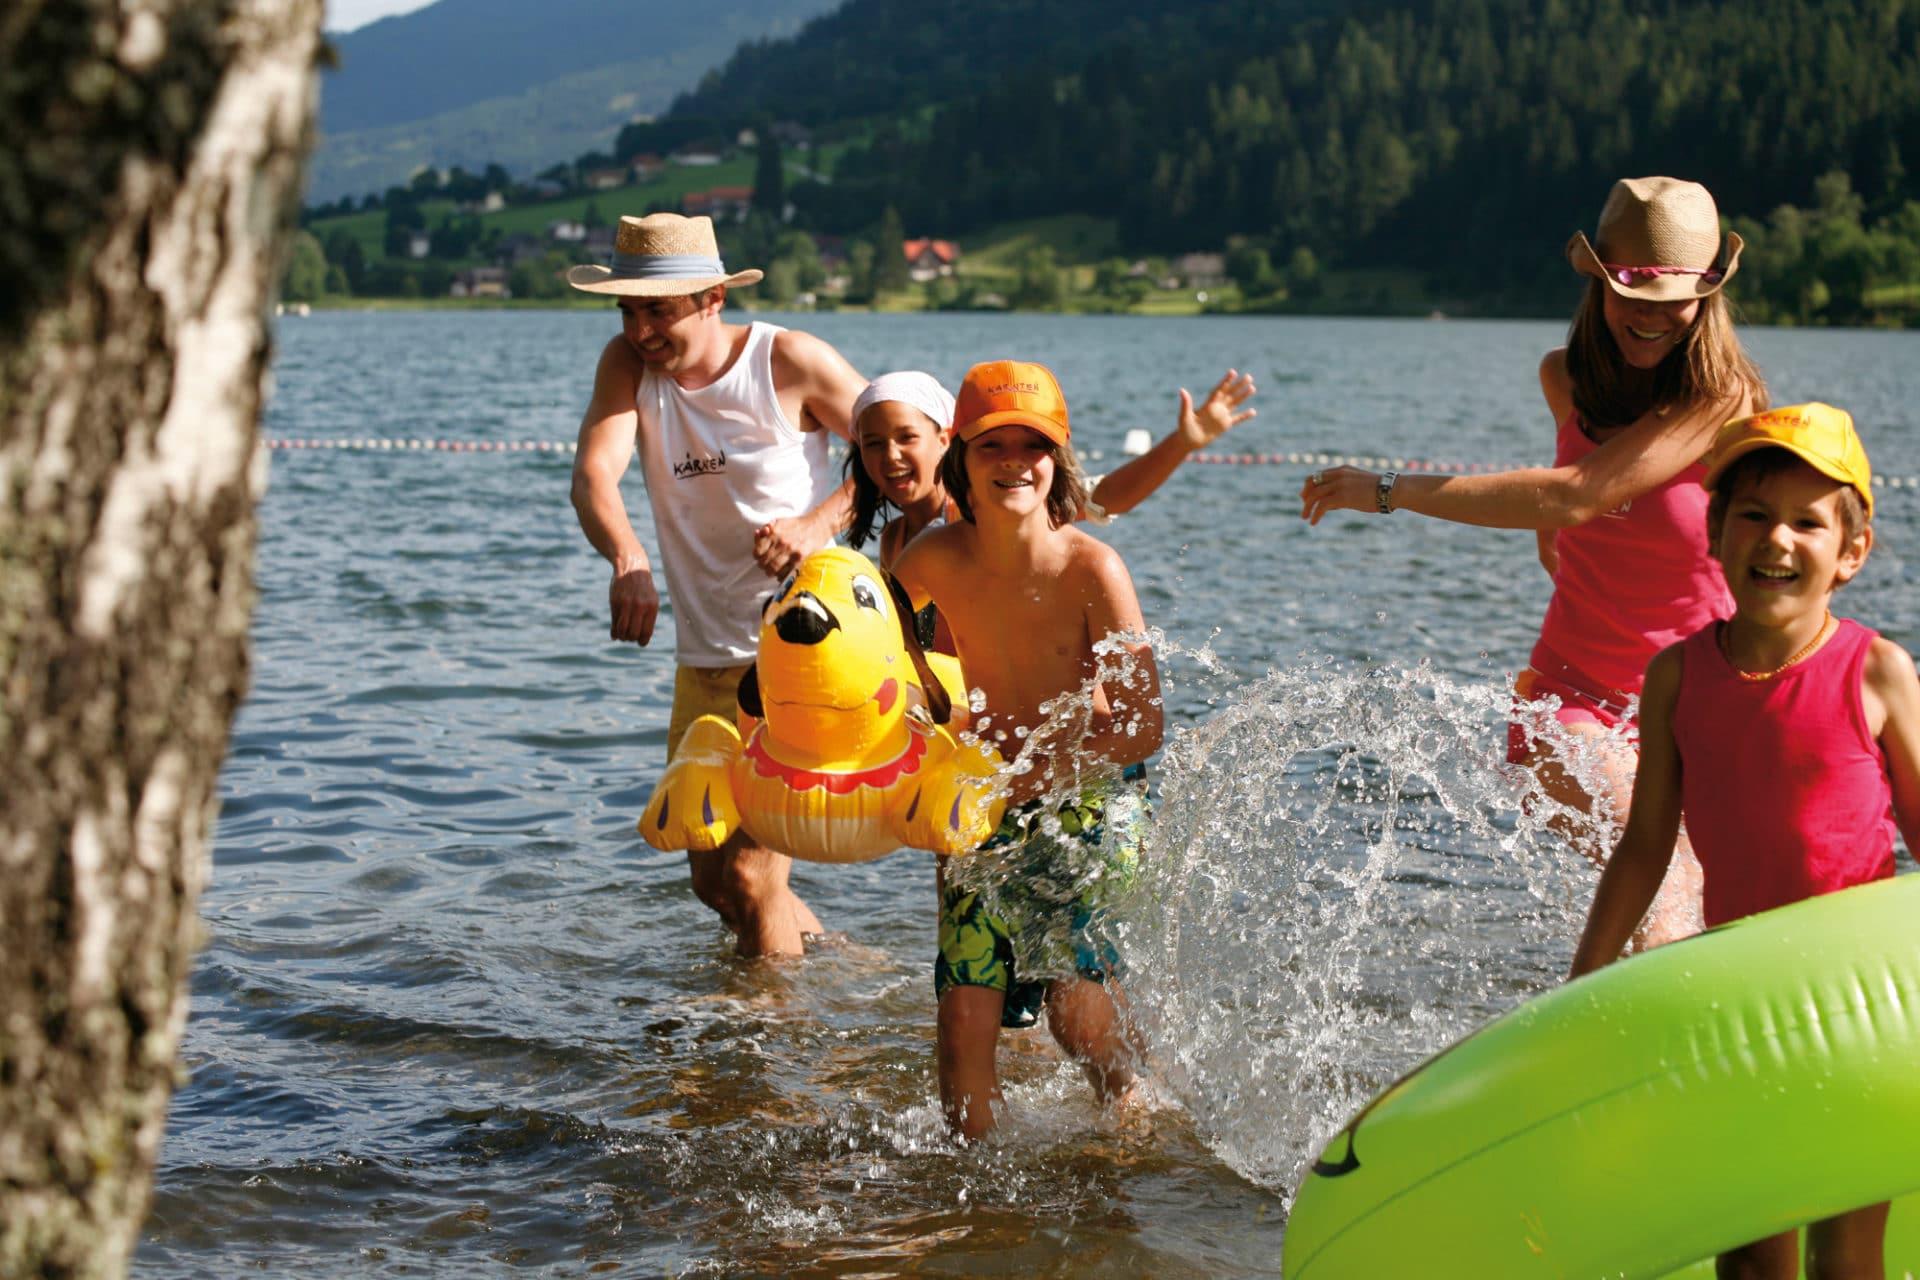 Baby hotel Austria: Baby & KinderHotel a Trebesing, estate